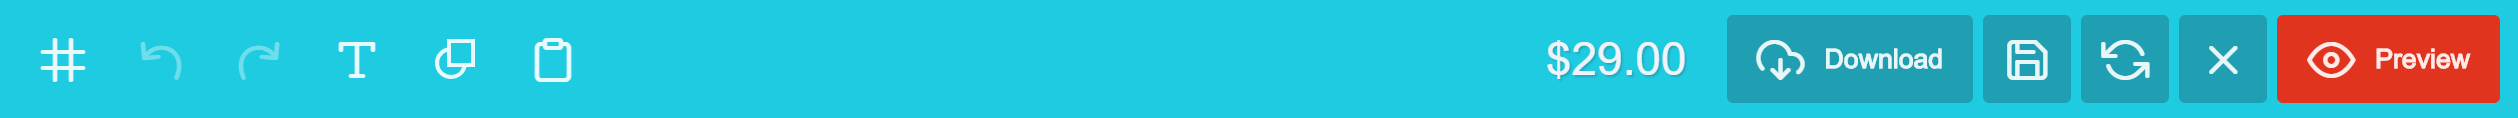 Annotation-2020-05-04-074610